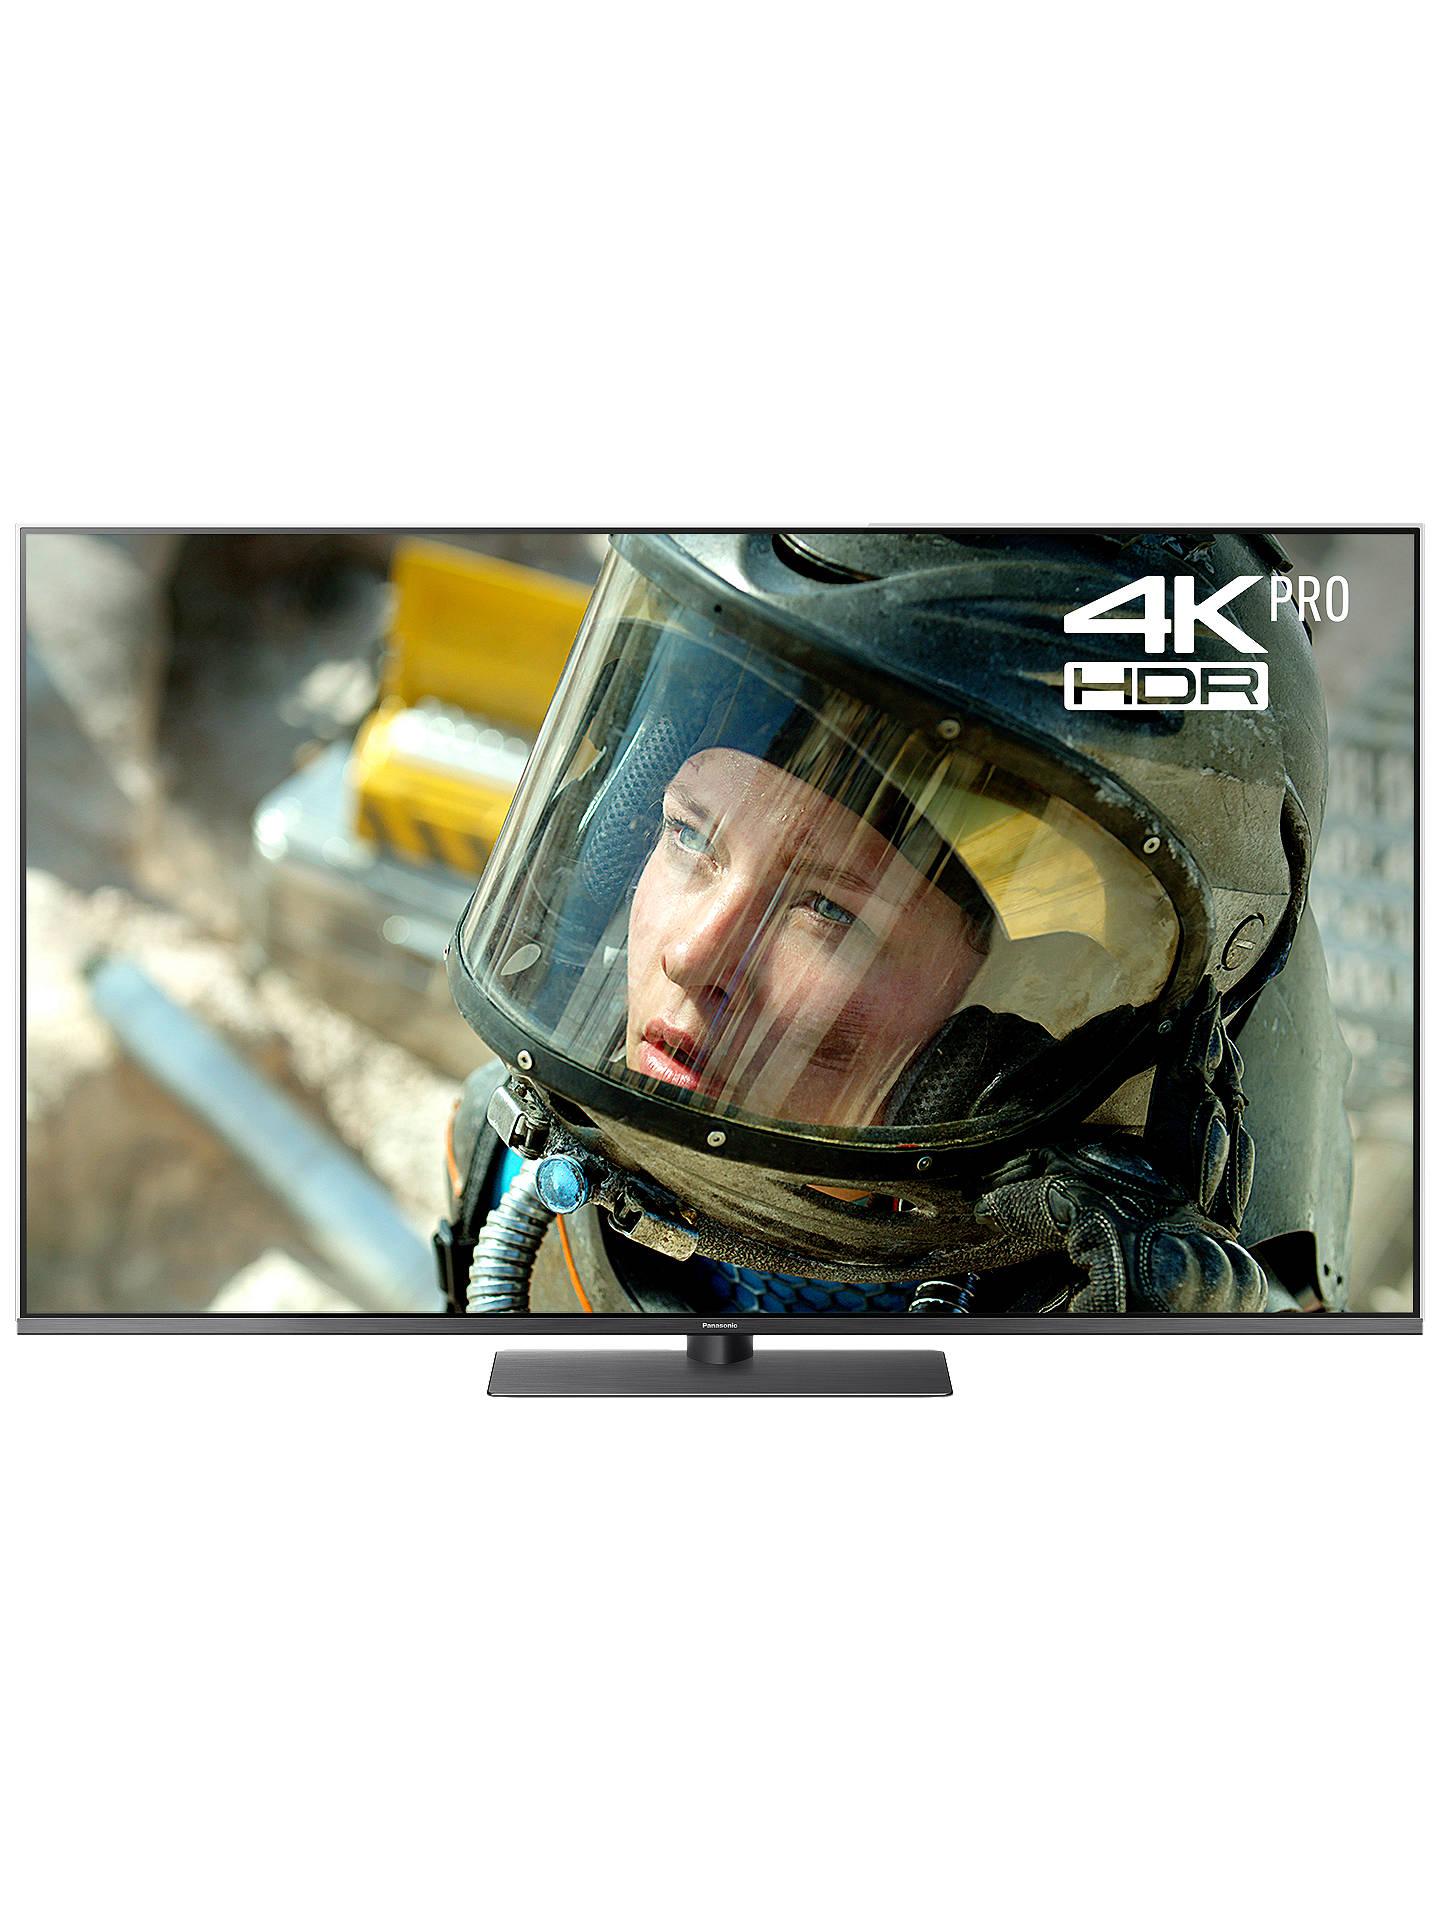 Panasonic TX-55FX750B £939.99 from Power Direct (John Lewis will Price match)  plus 5 year Warranty